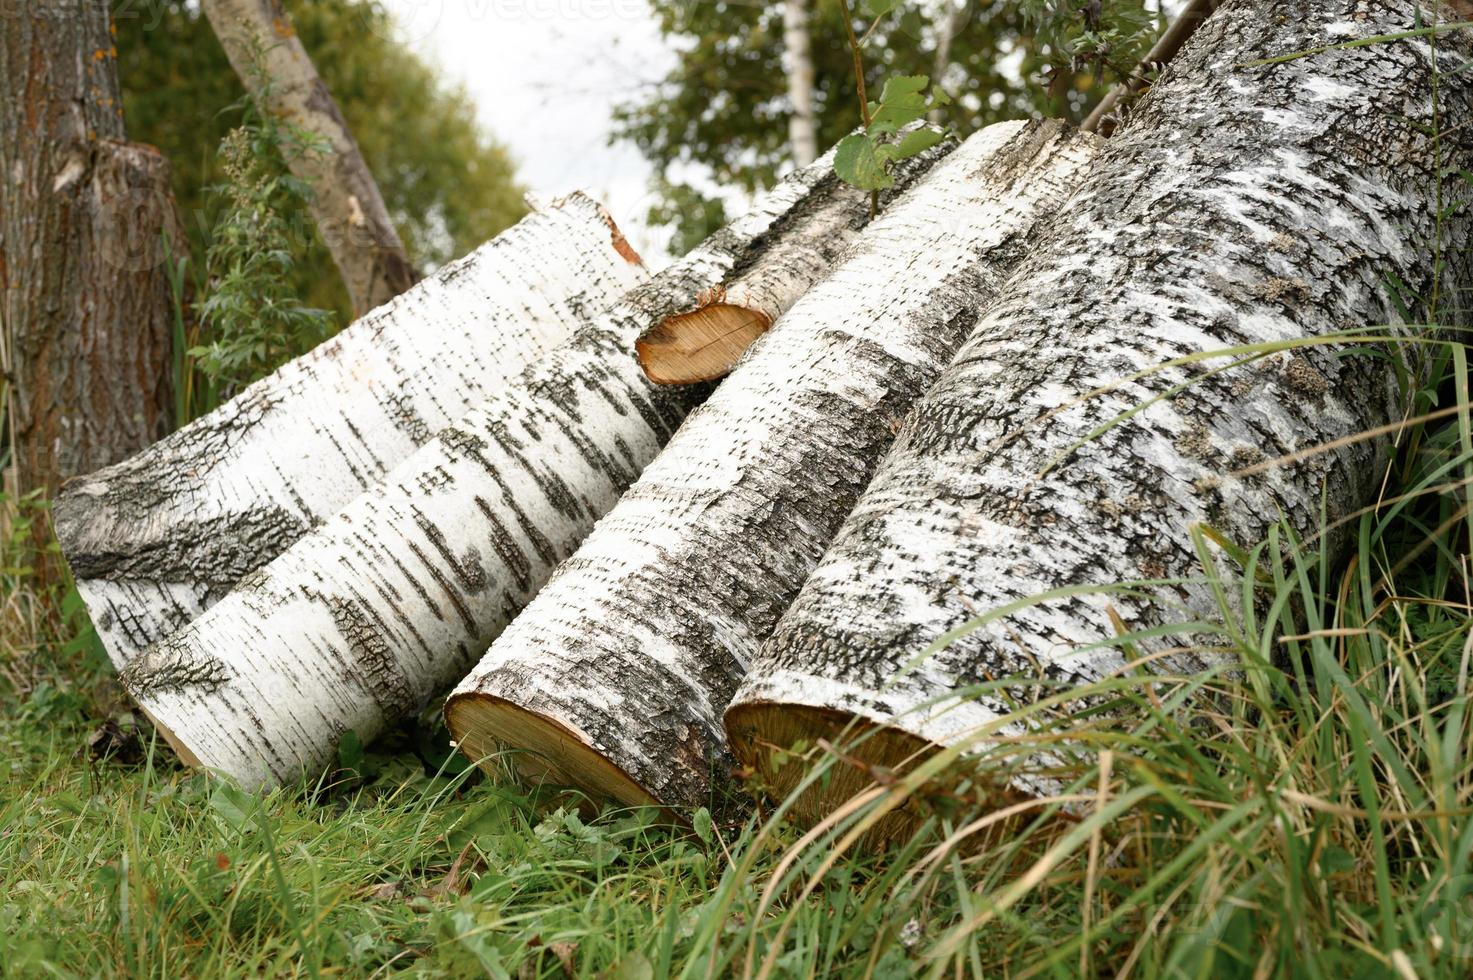 A few birch logs on the grass photo